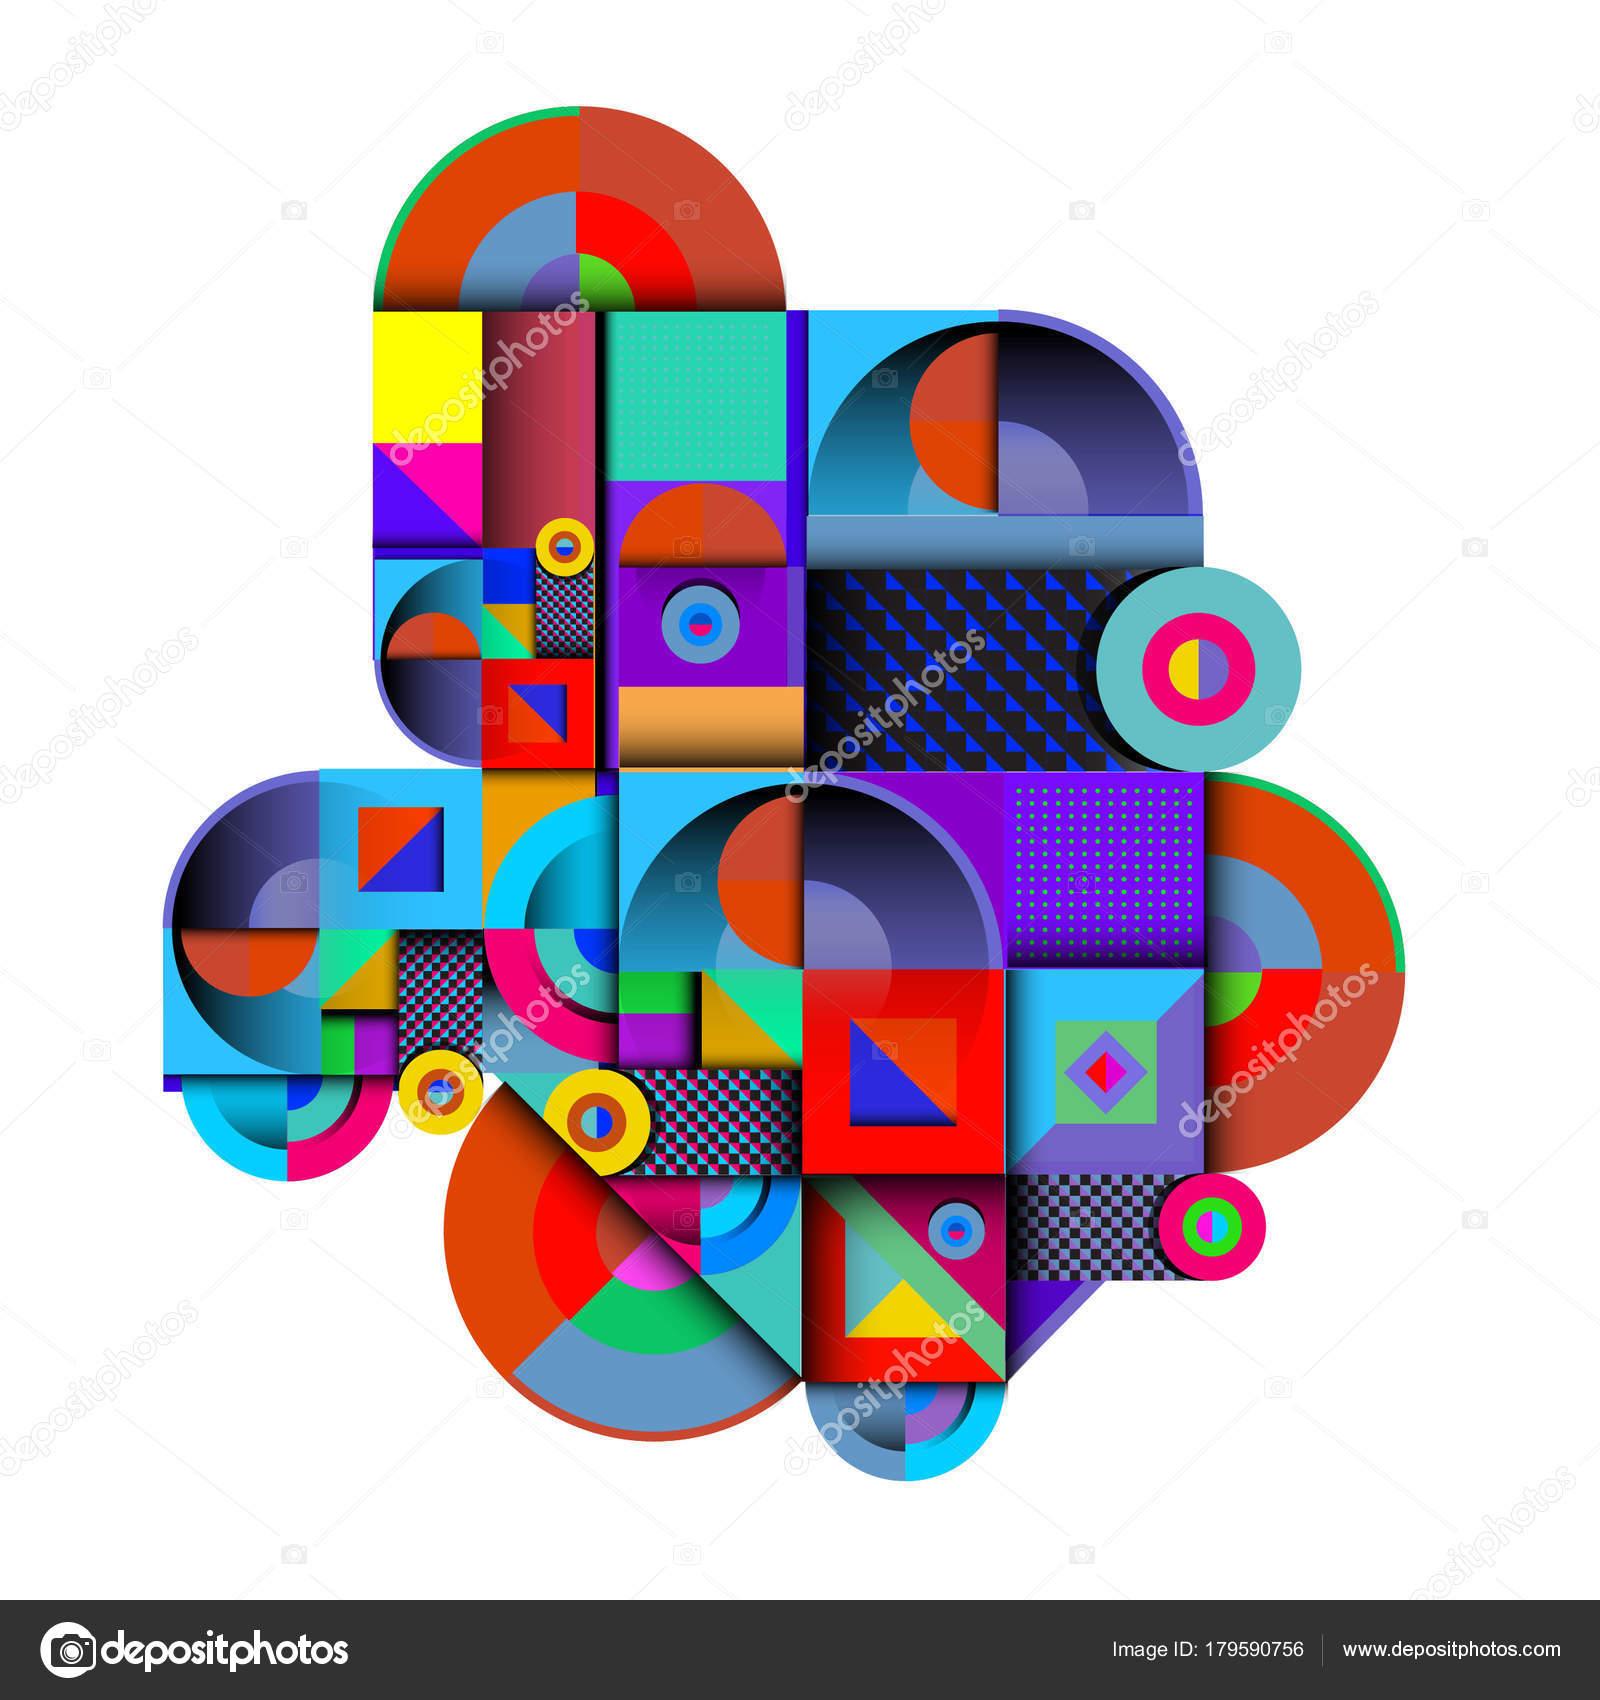 Trendy Curvy Geometric Memphis Elements Colorful Design Retro 90S Style